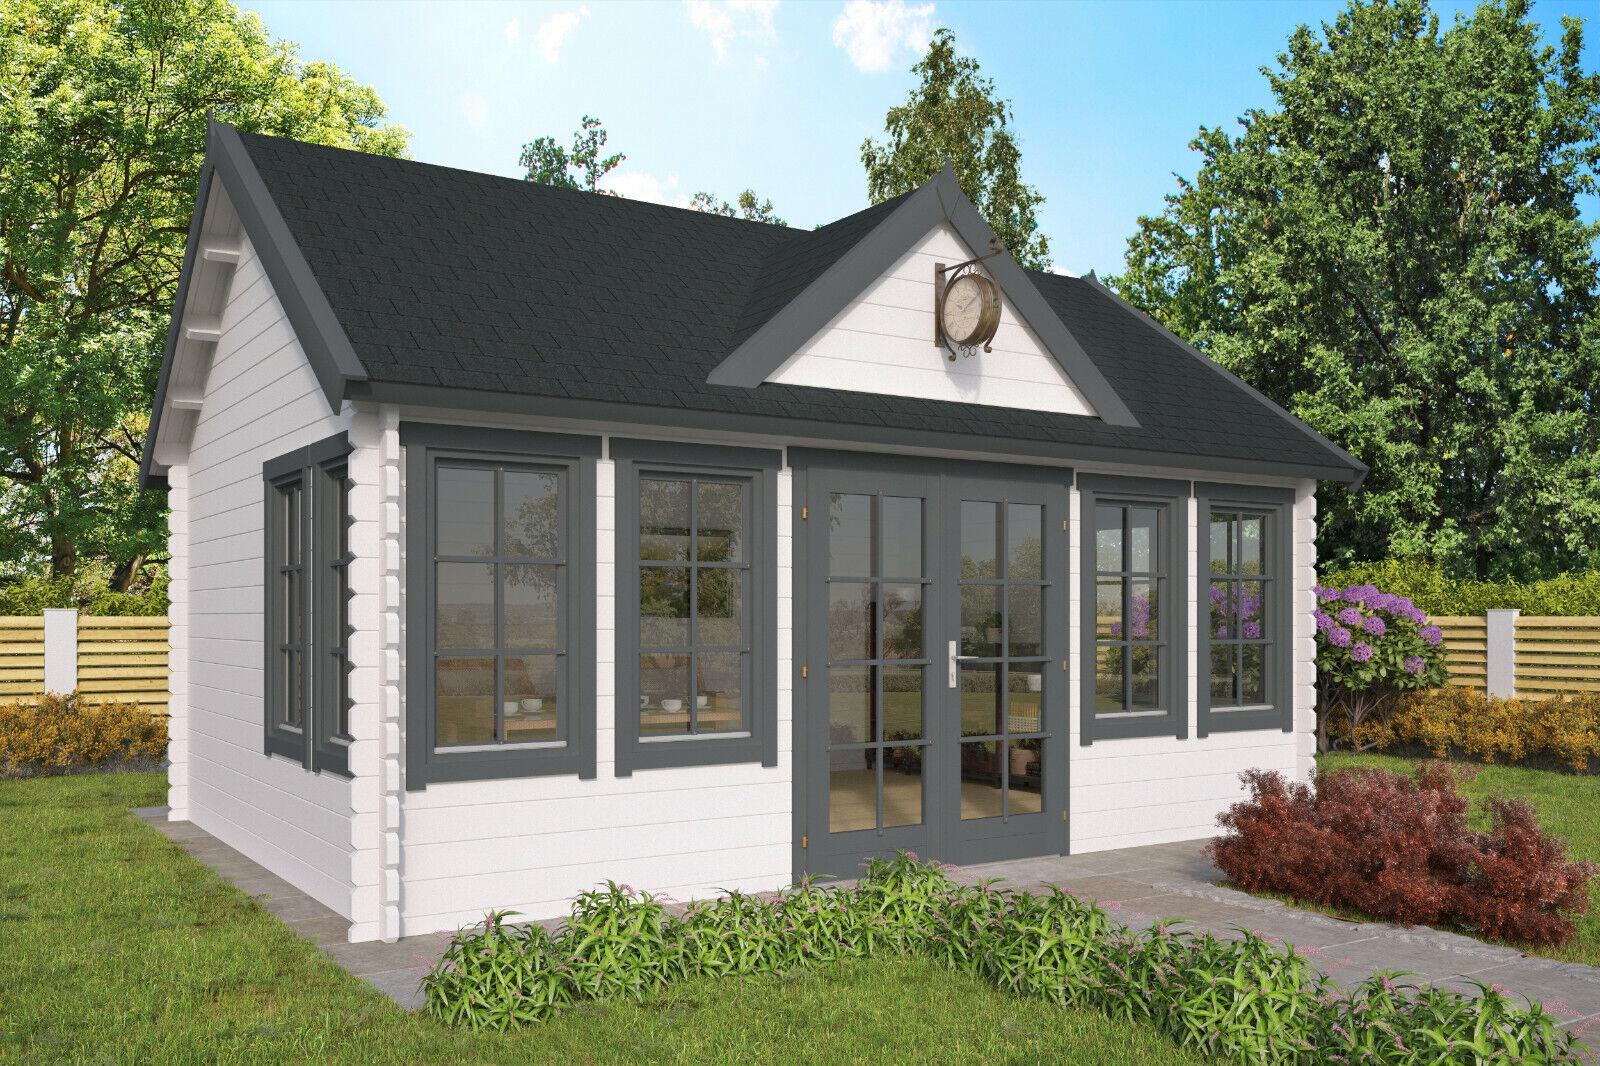 44mm Gartenhaus ISO-Glas 550x400cm Blockhaus Holzhaus Gerätehaus Holz Ferienhaus